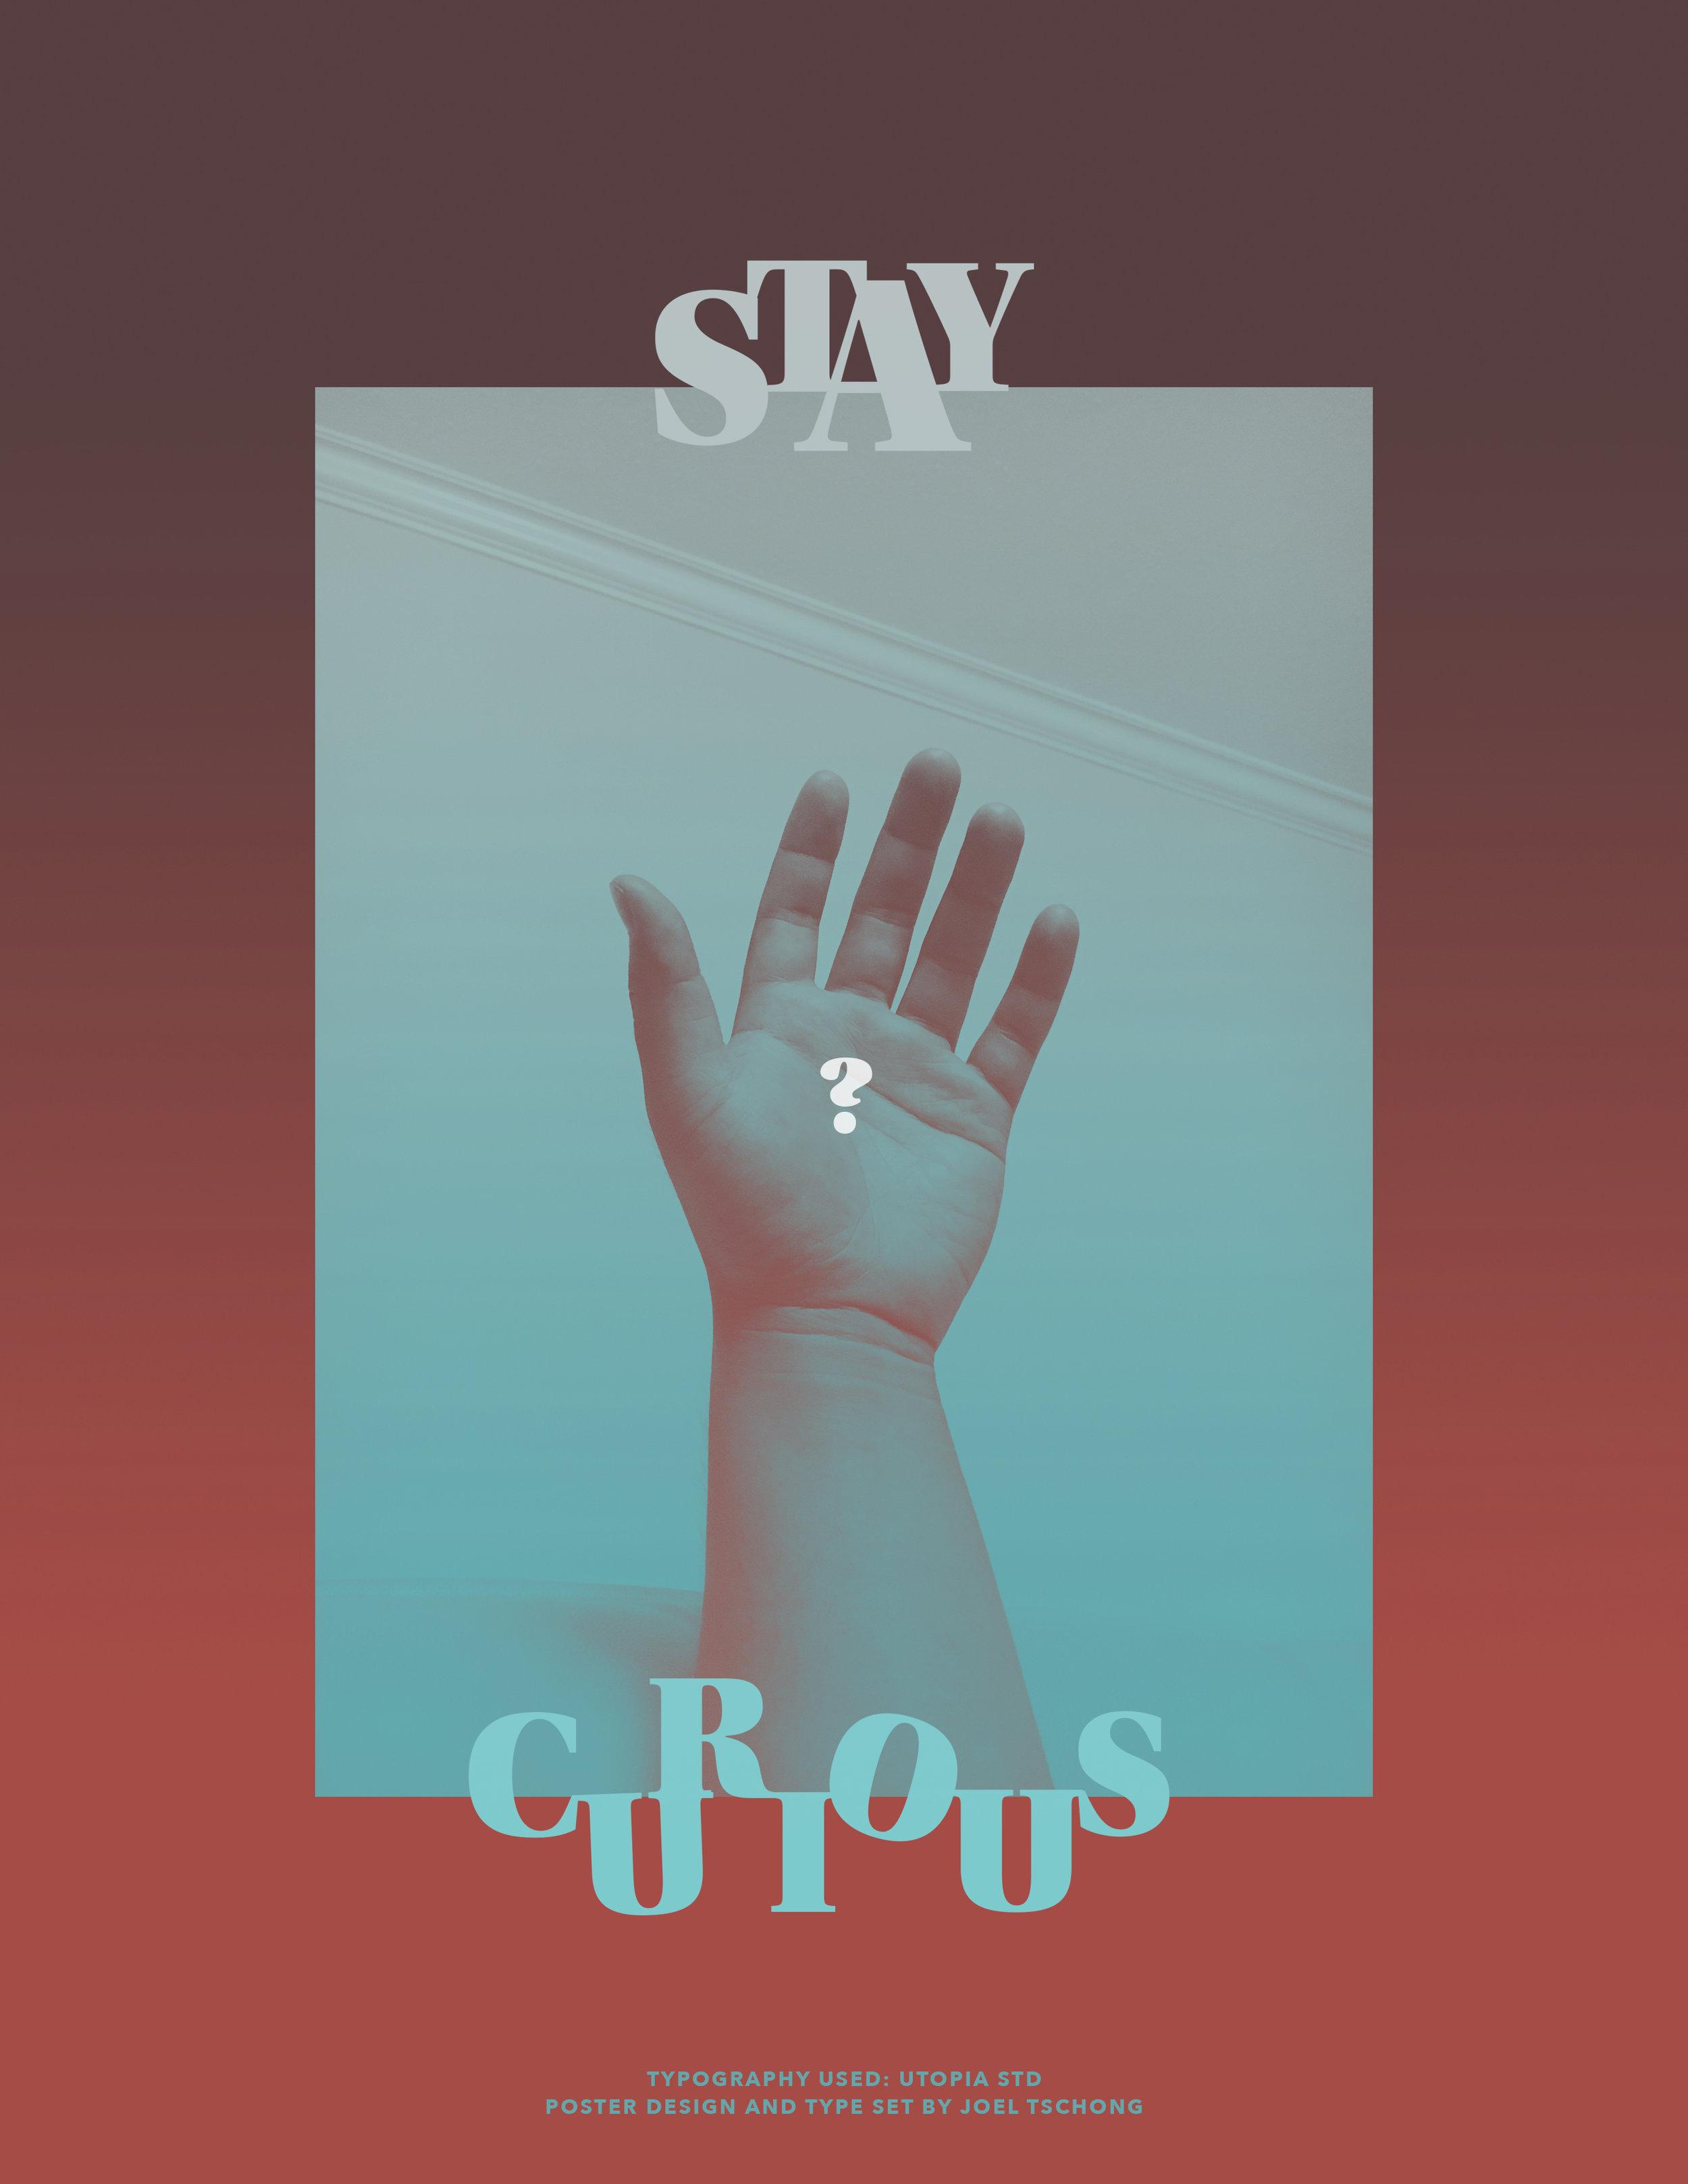 staycurious.jpg